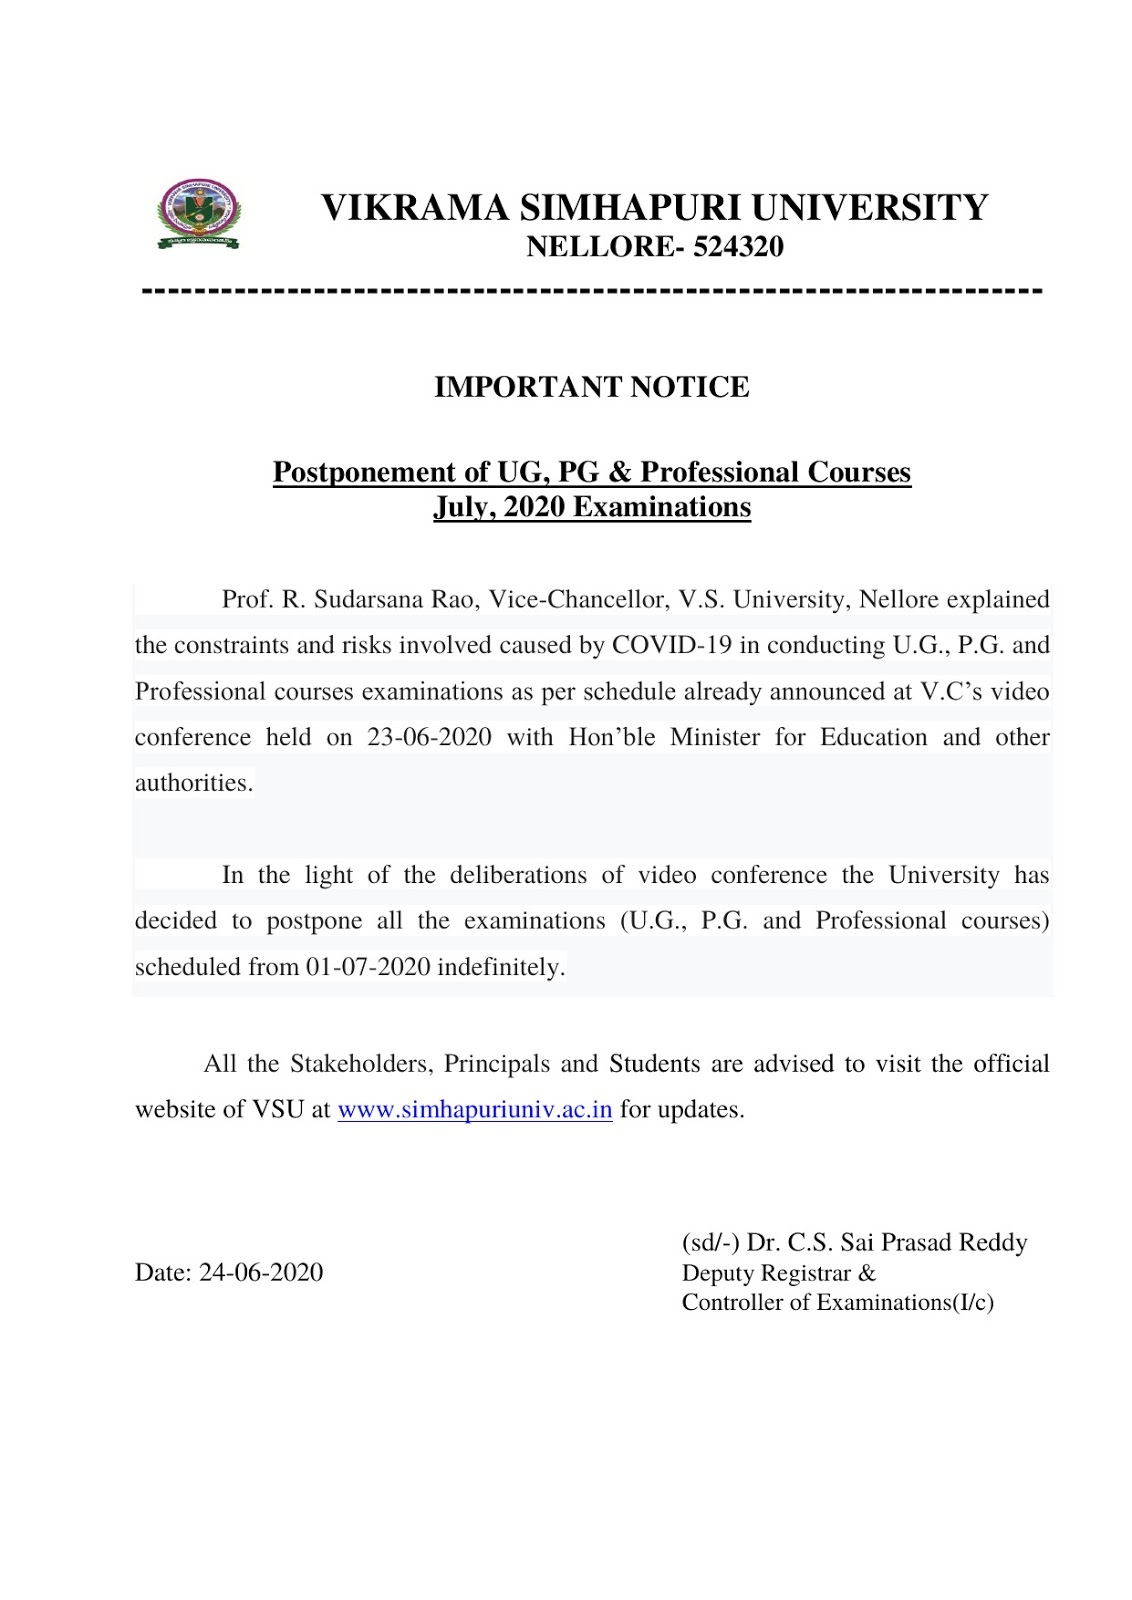 Vikrama Simhapuri University UG,PG & Professional Courses 2020 Postponed Exam Notification